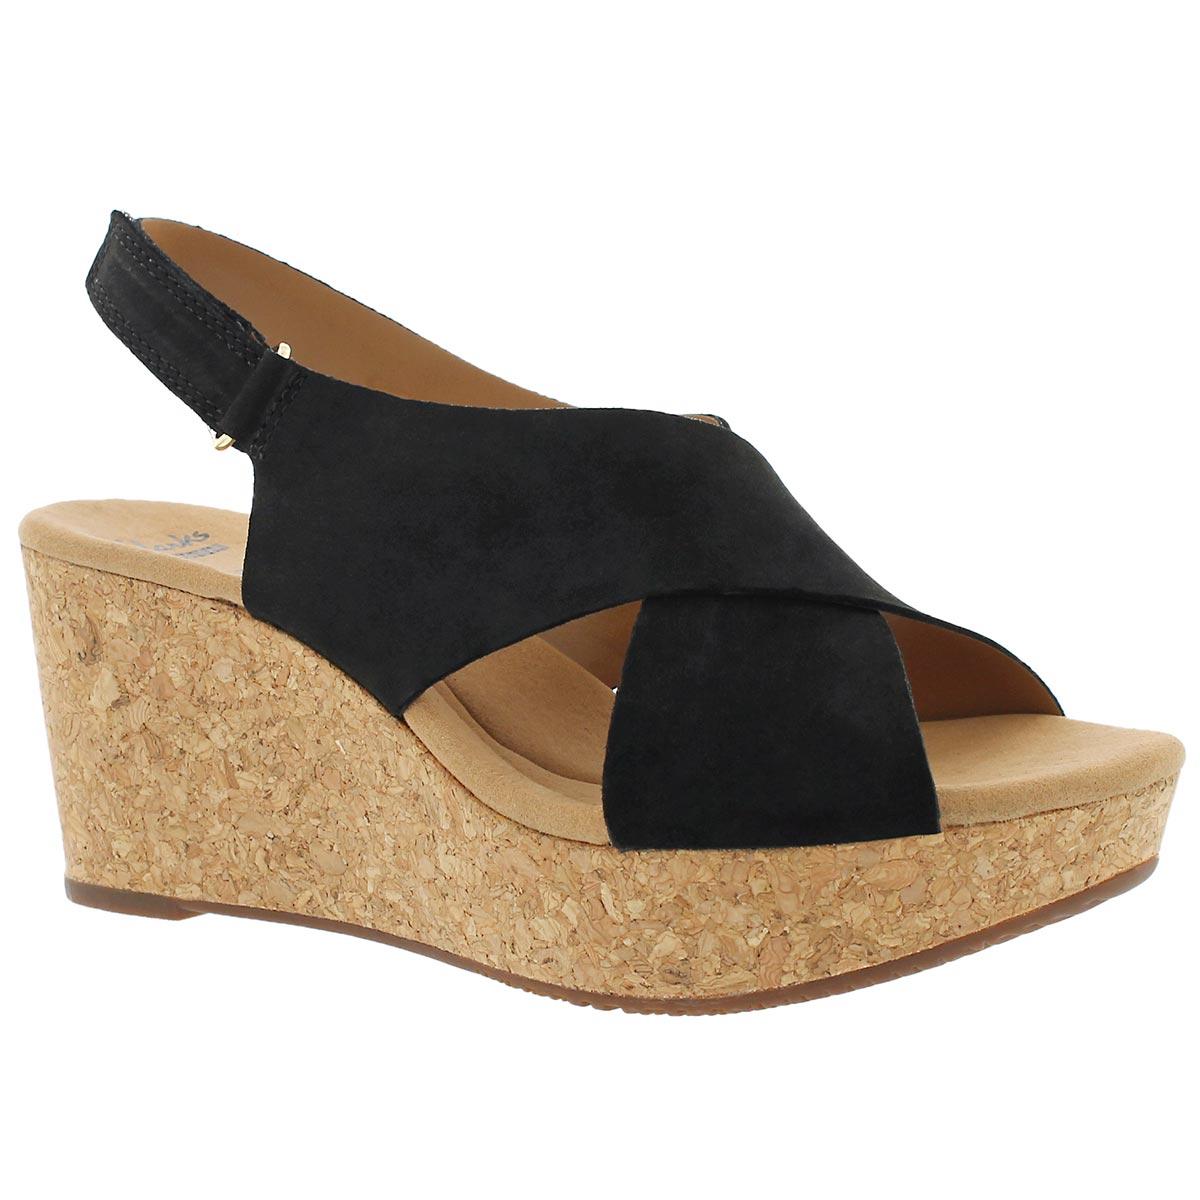 Lds Annadel Eirwyn black wedge sandal